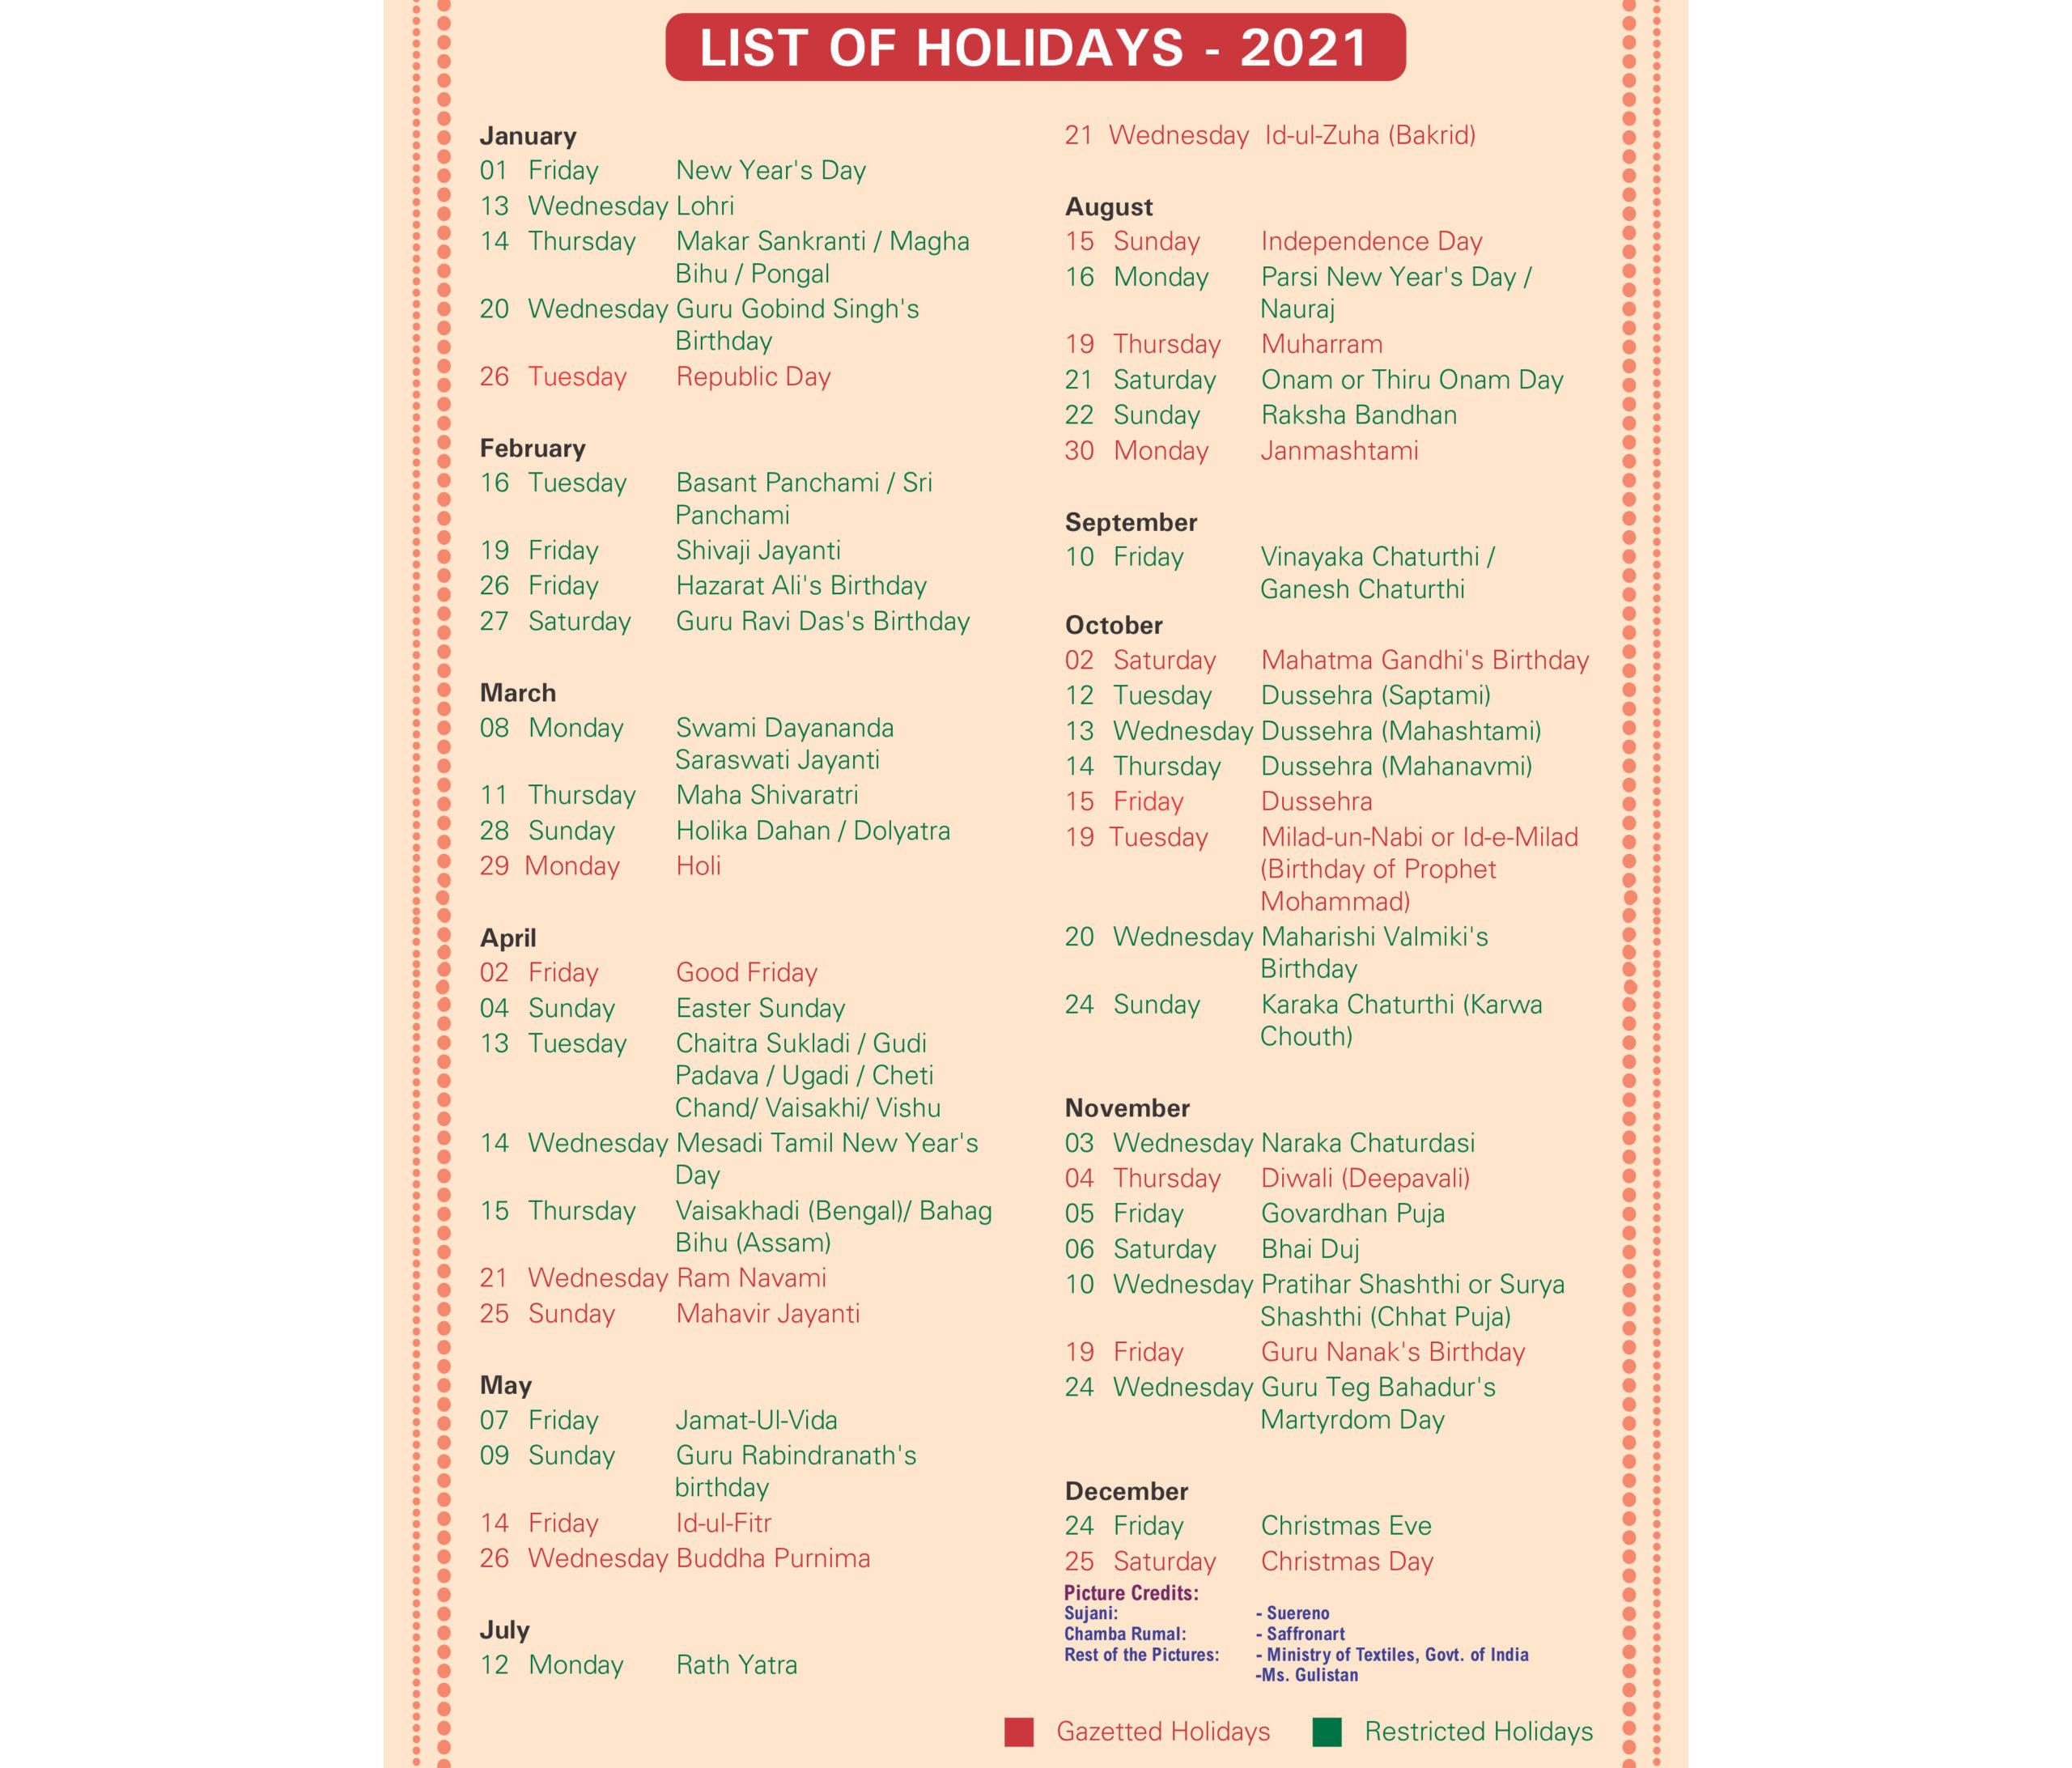 India Post Holiday Calendar 2021